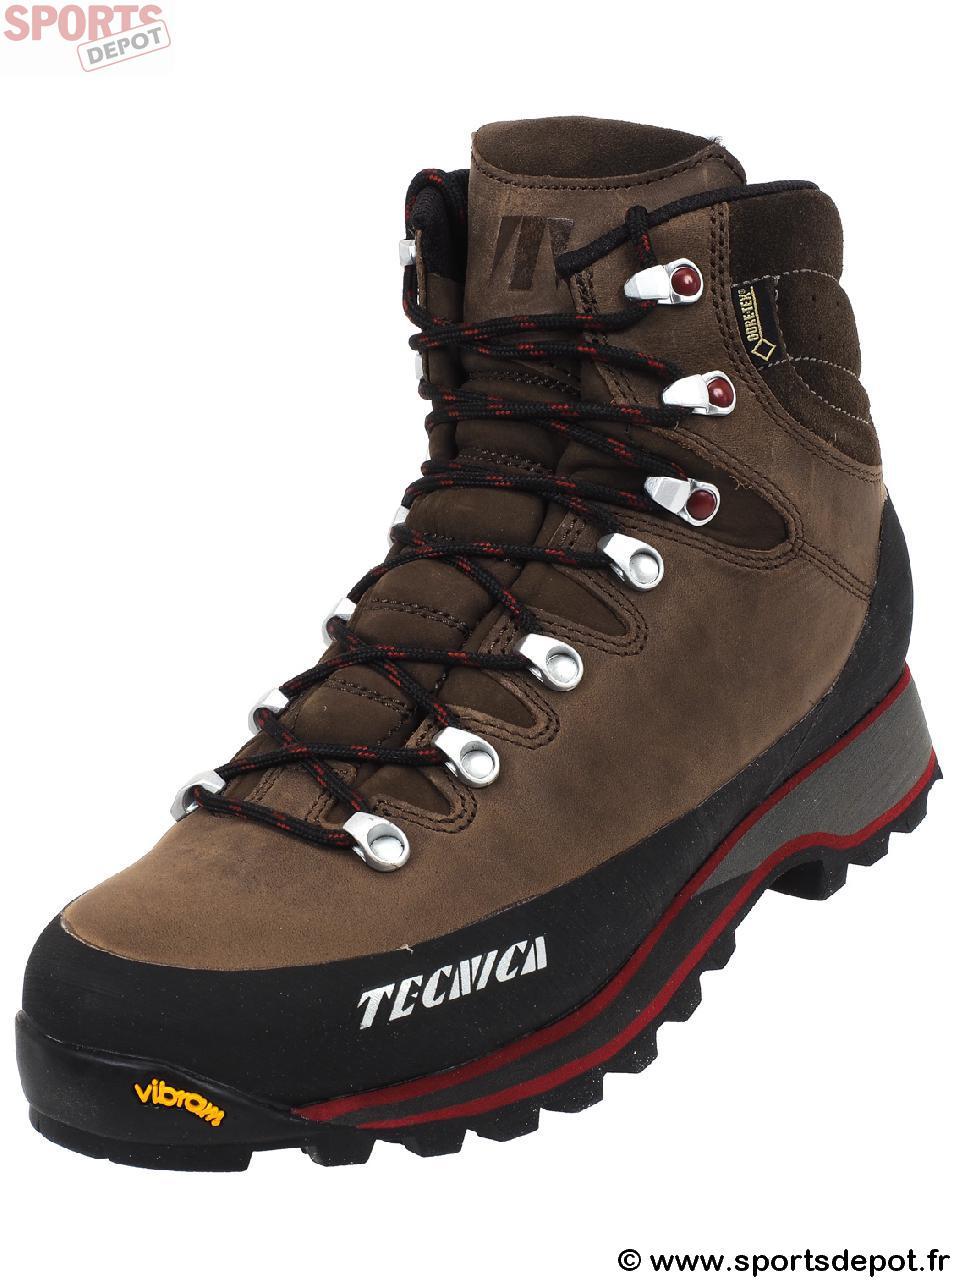 da4450a1407 Acheter Chaussures marche randonnées TECNICA Trek alps gtx vibram ...